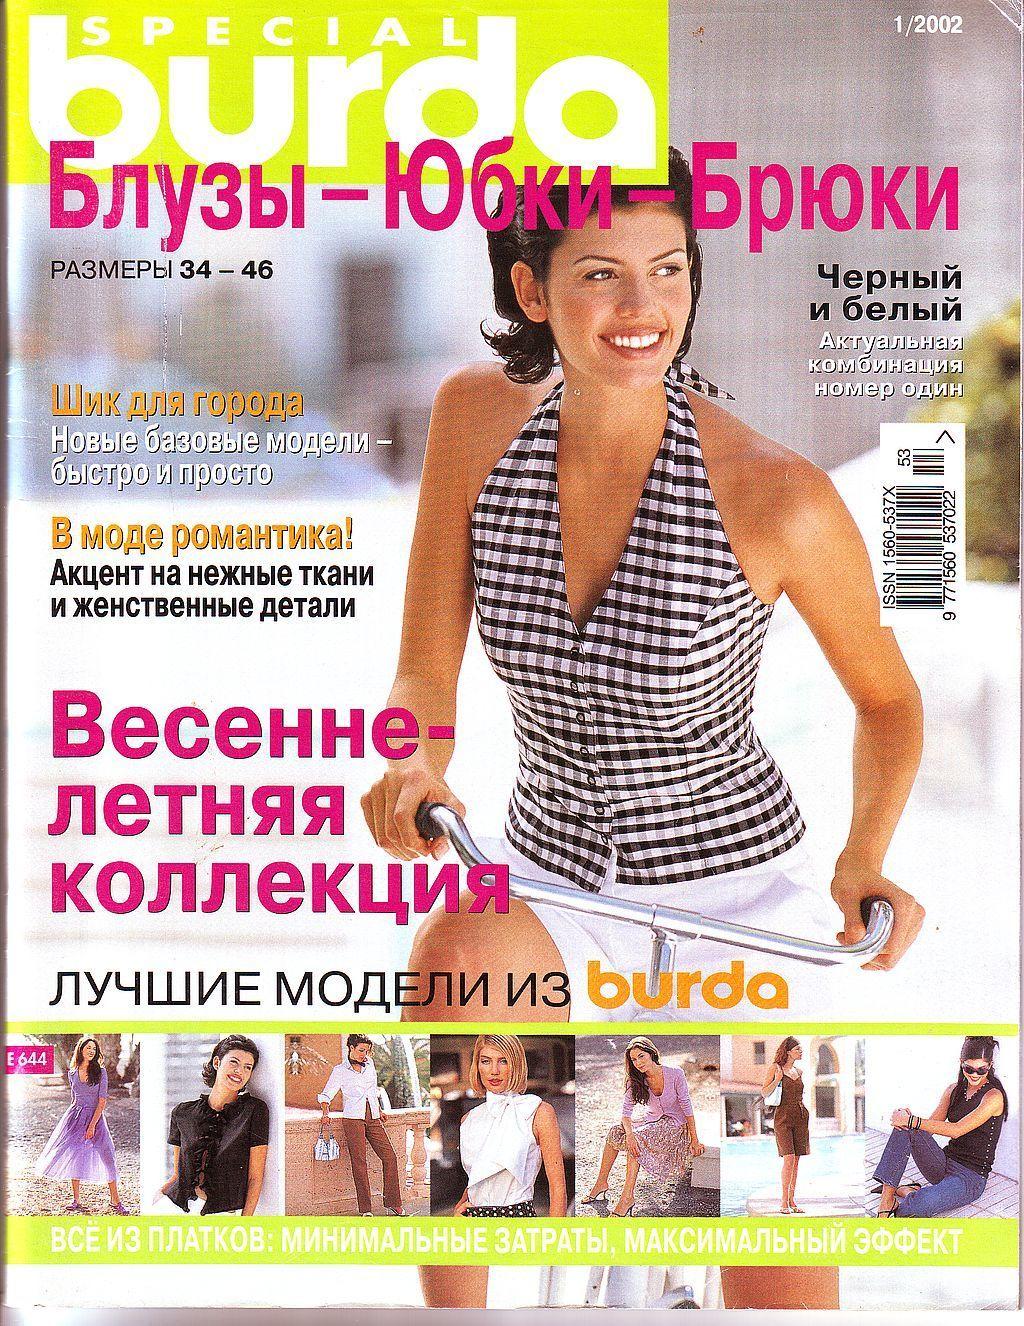 "Журнал Burda SPECIAL ""Блузы Юбки Брюки"", № 1/2002 г, Выкройки для шитья, Москва,  Фото №1"